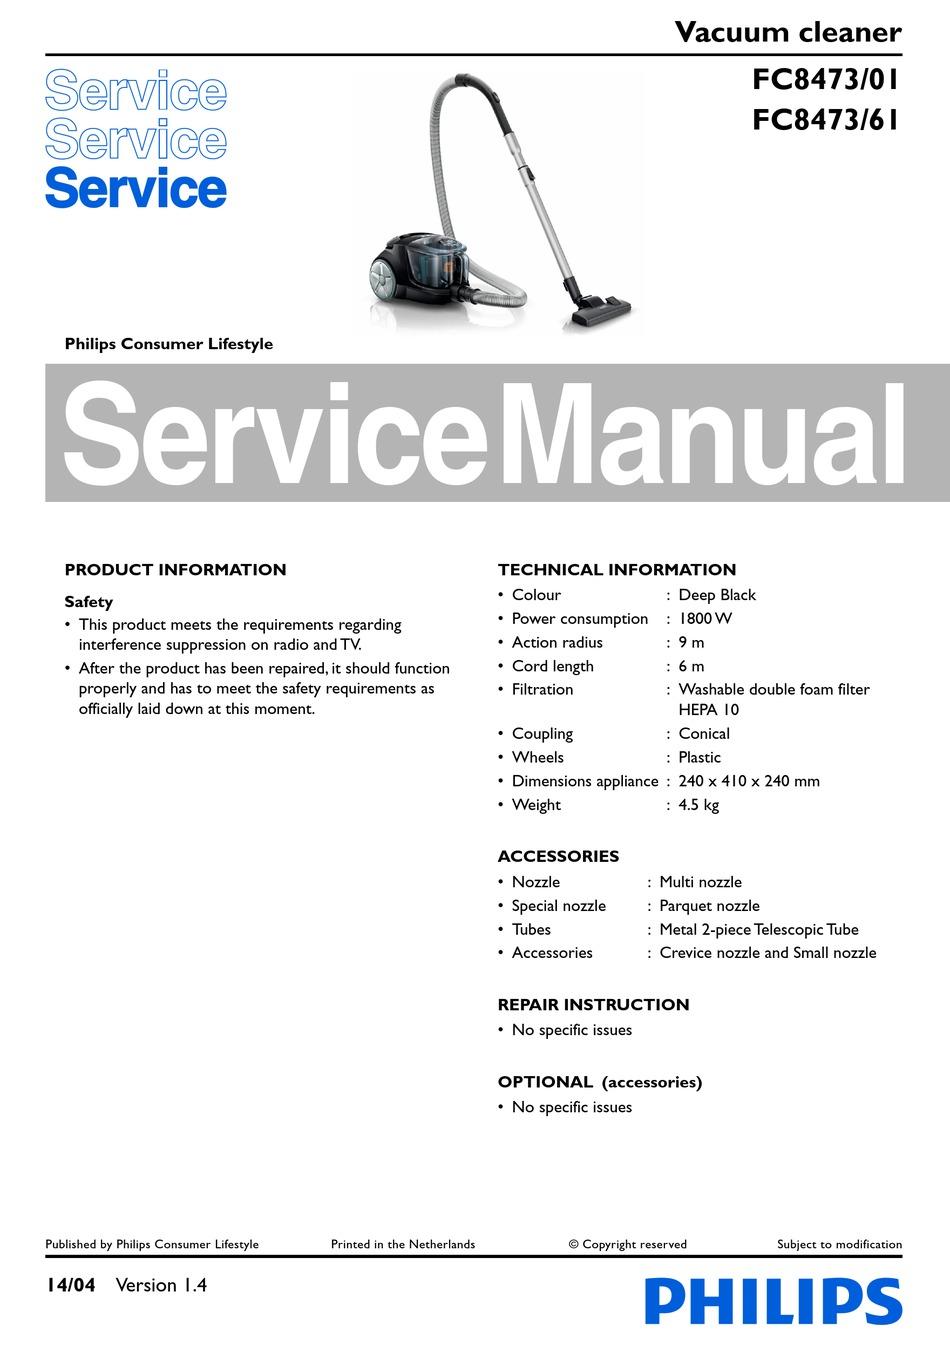 PHILIPS FC8473 SERVICE MANUAL Pdf Download | ManualsLib